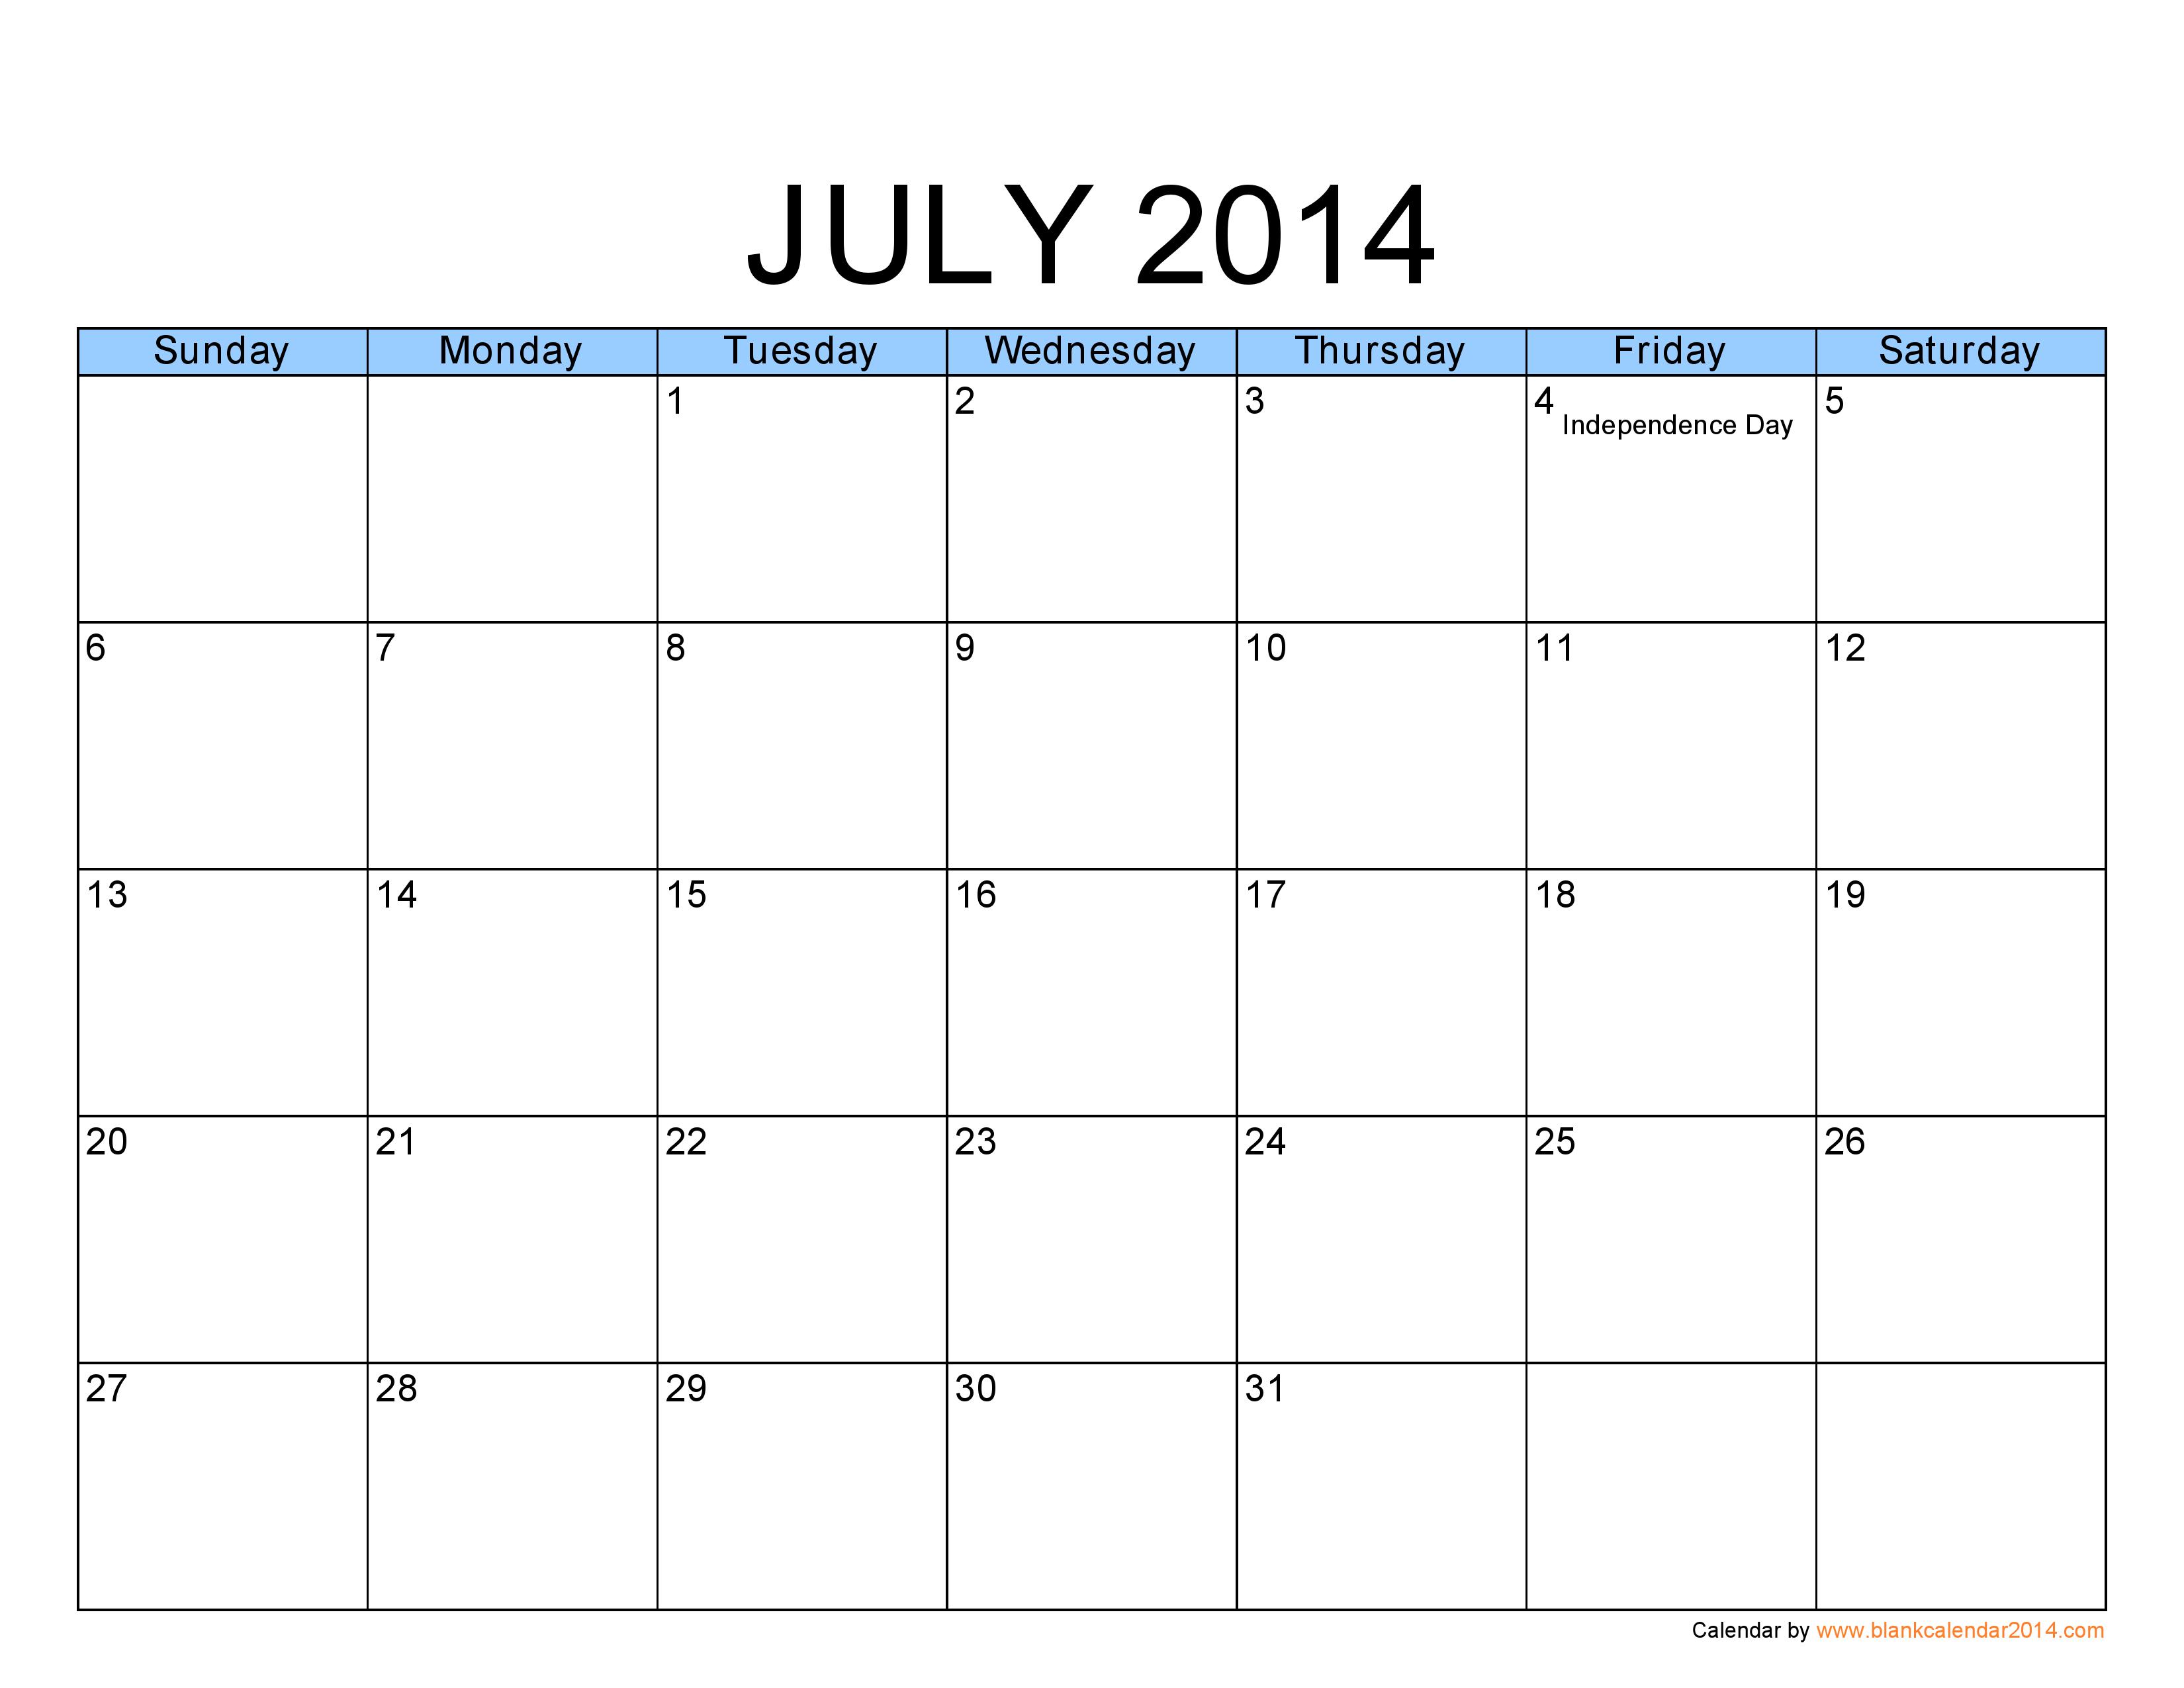 July Calendar | Fotolip.com Rich image and wallpaper